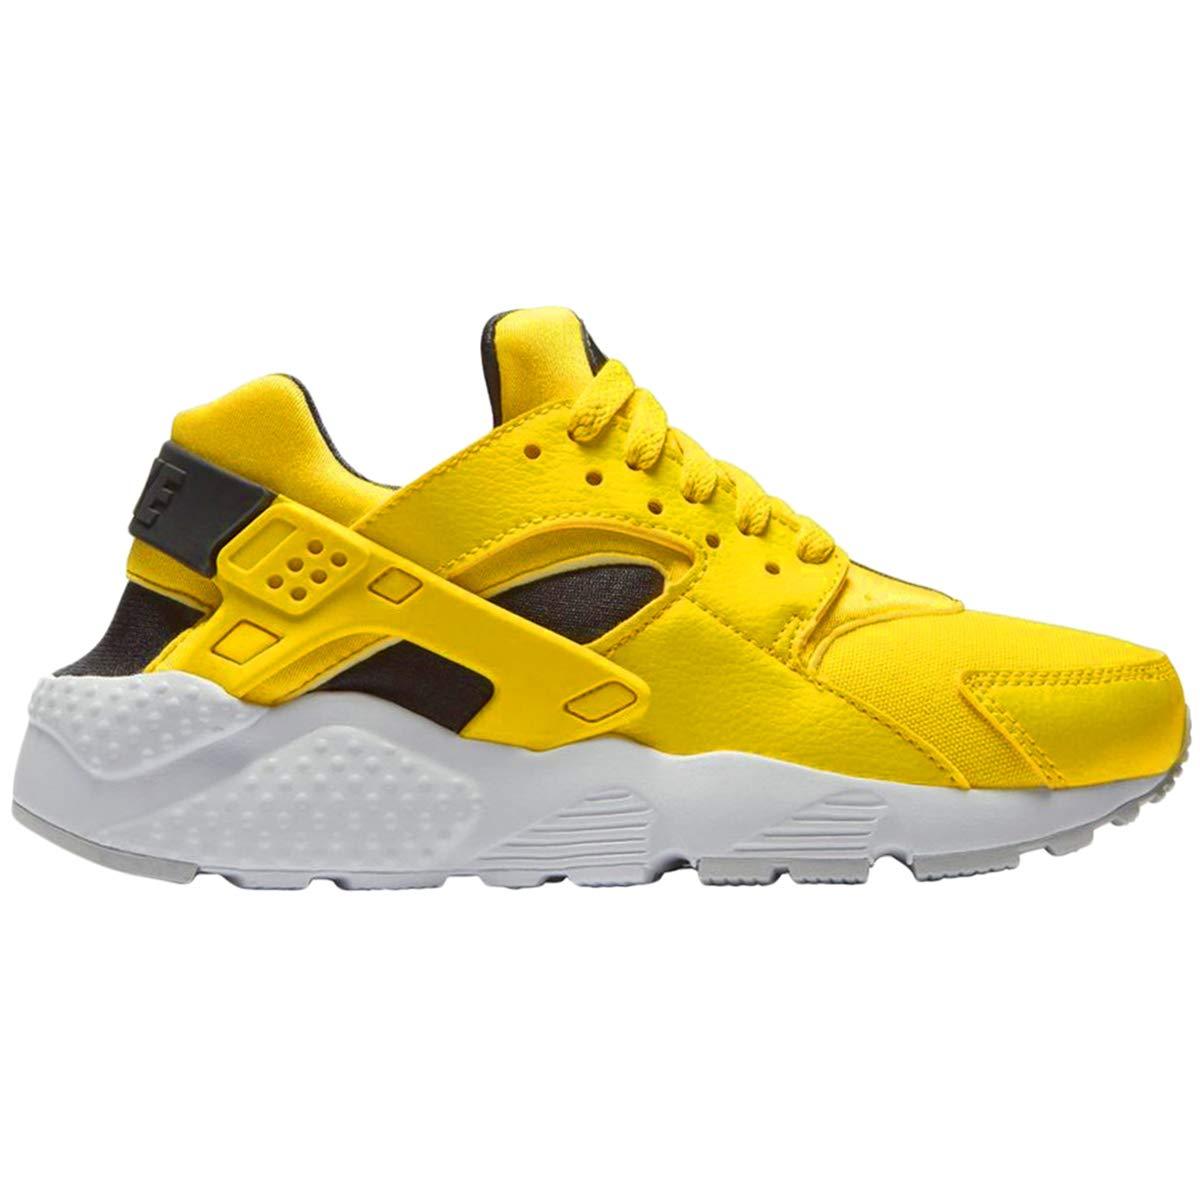 buy online 86f77 e77c6 NIKE Huarache Run Gs, Boys  Low Trainers